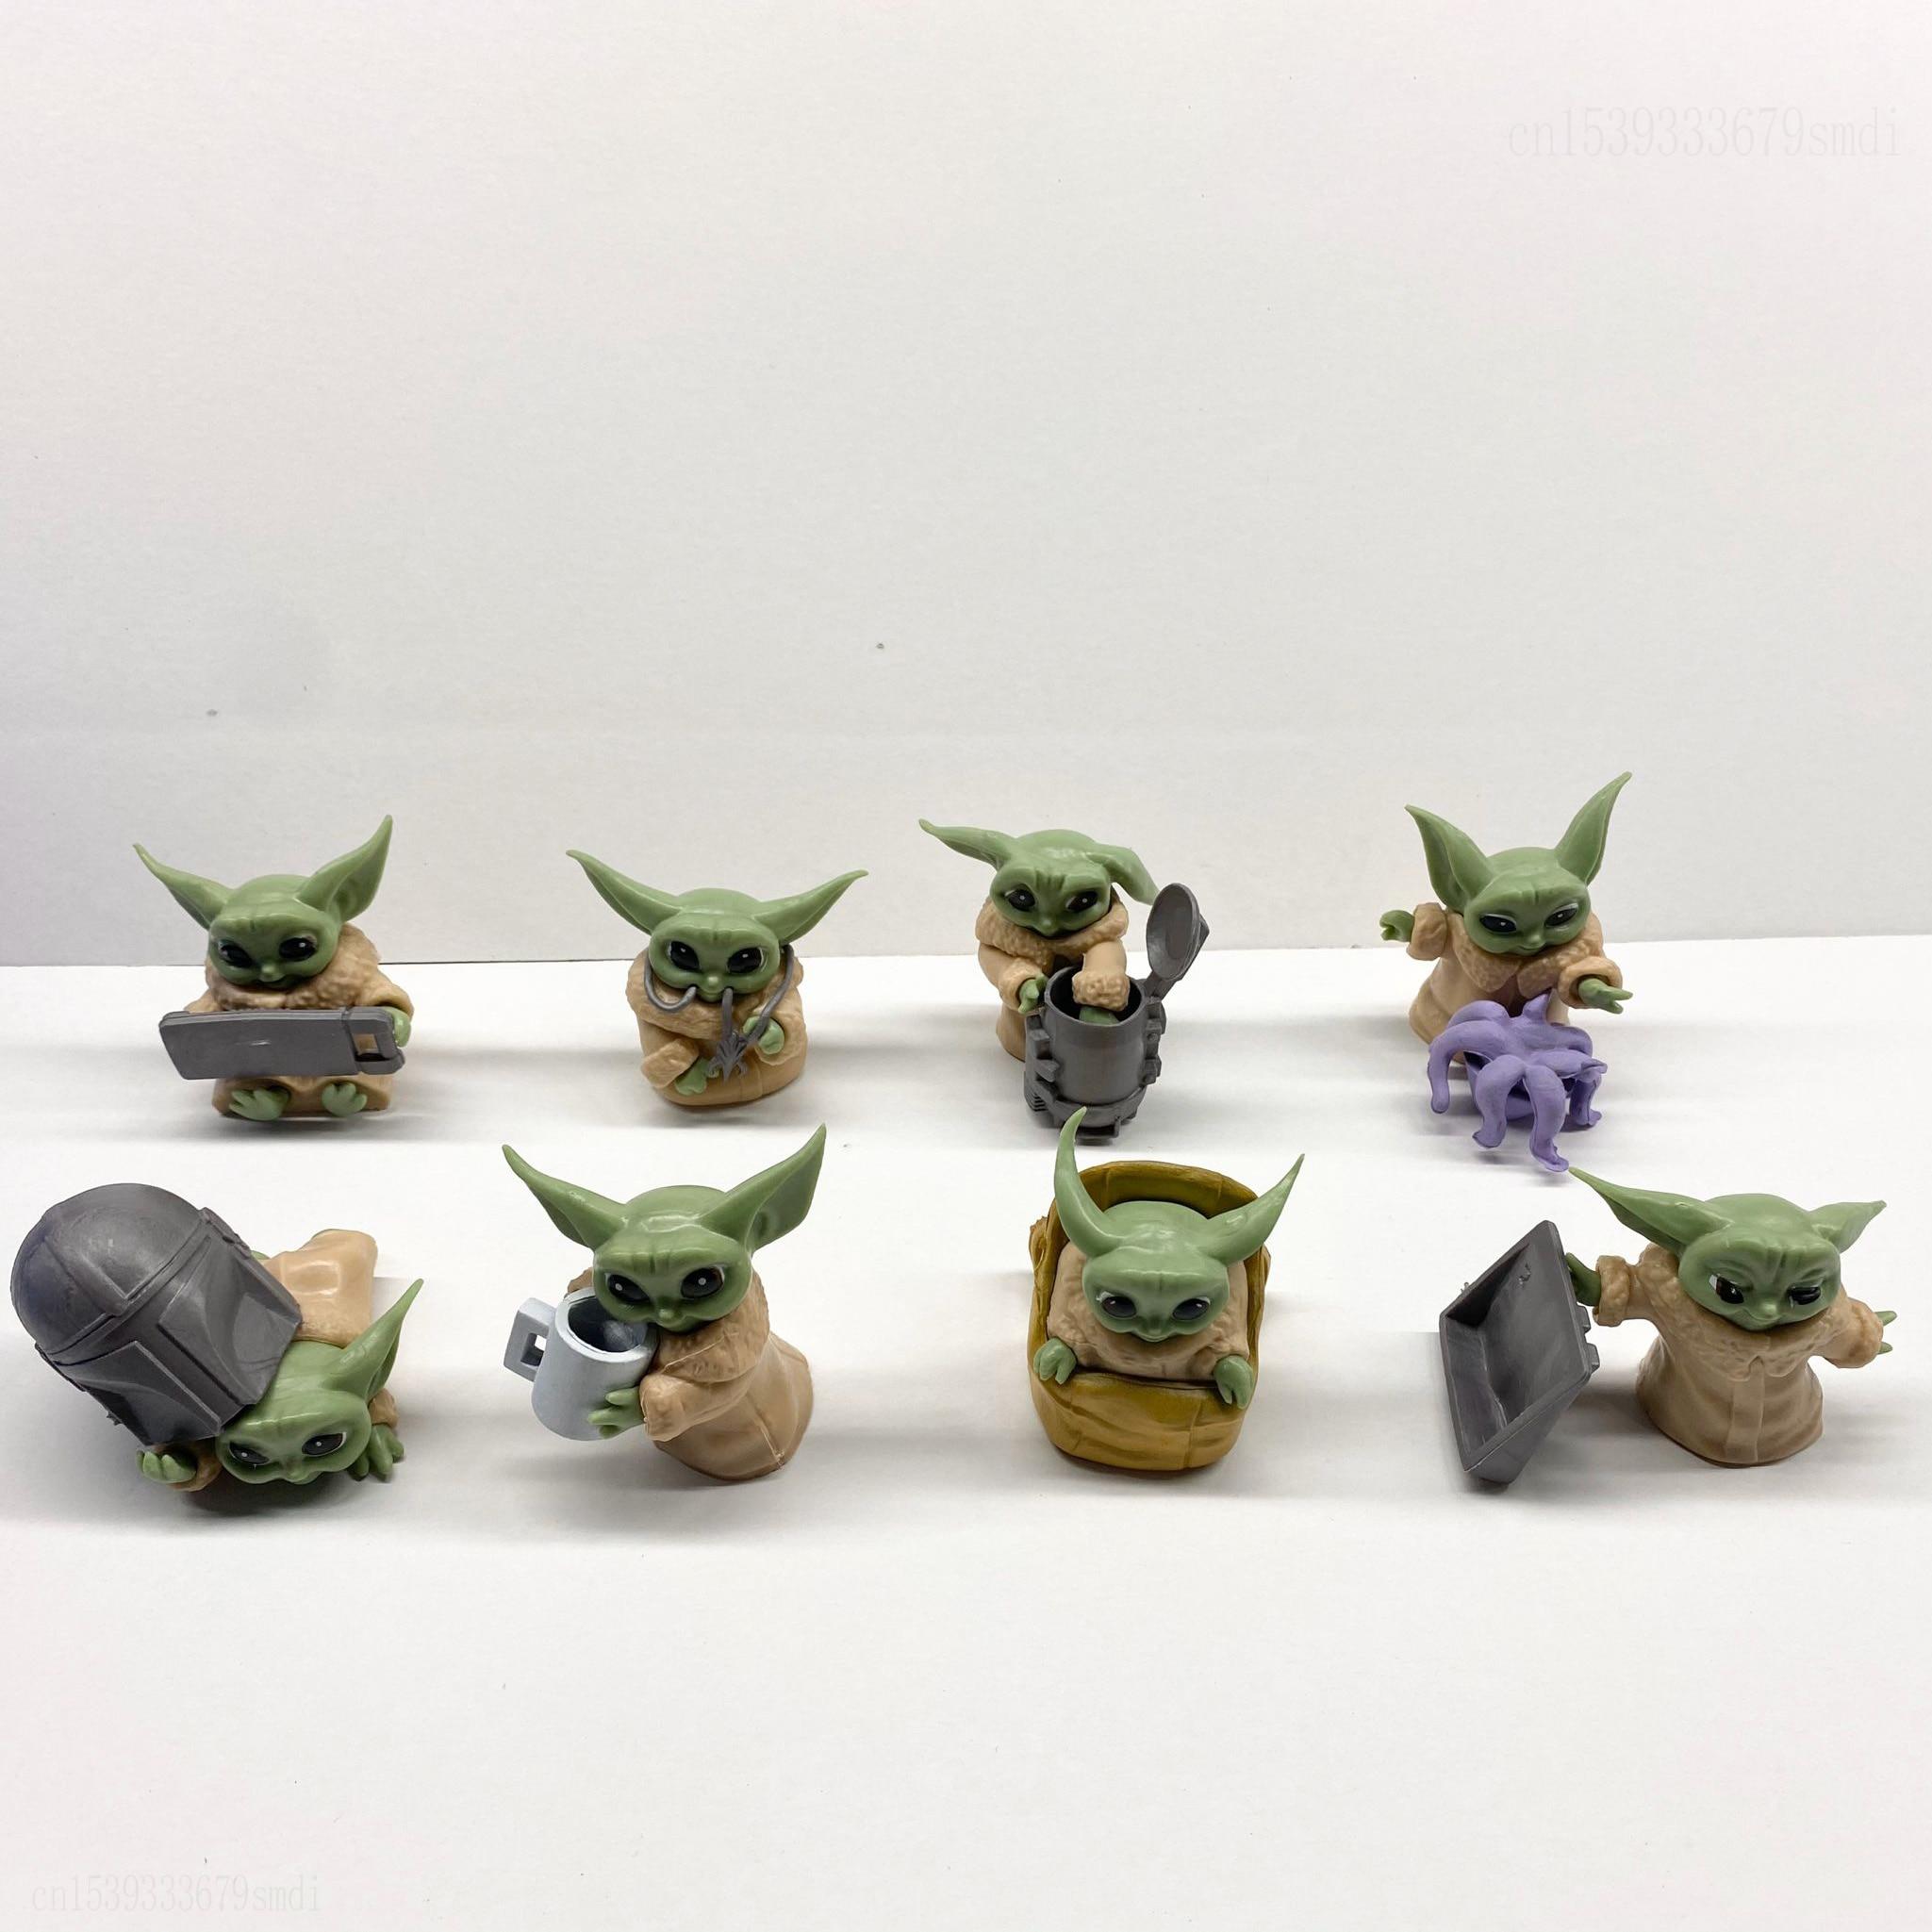 Action Figure, 8pcs, Yoda